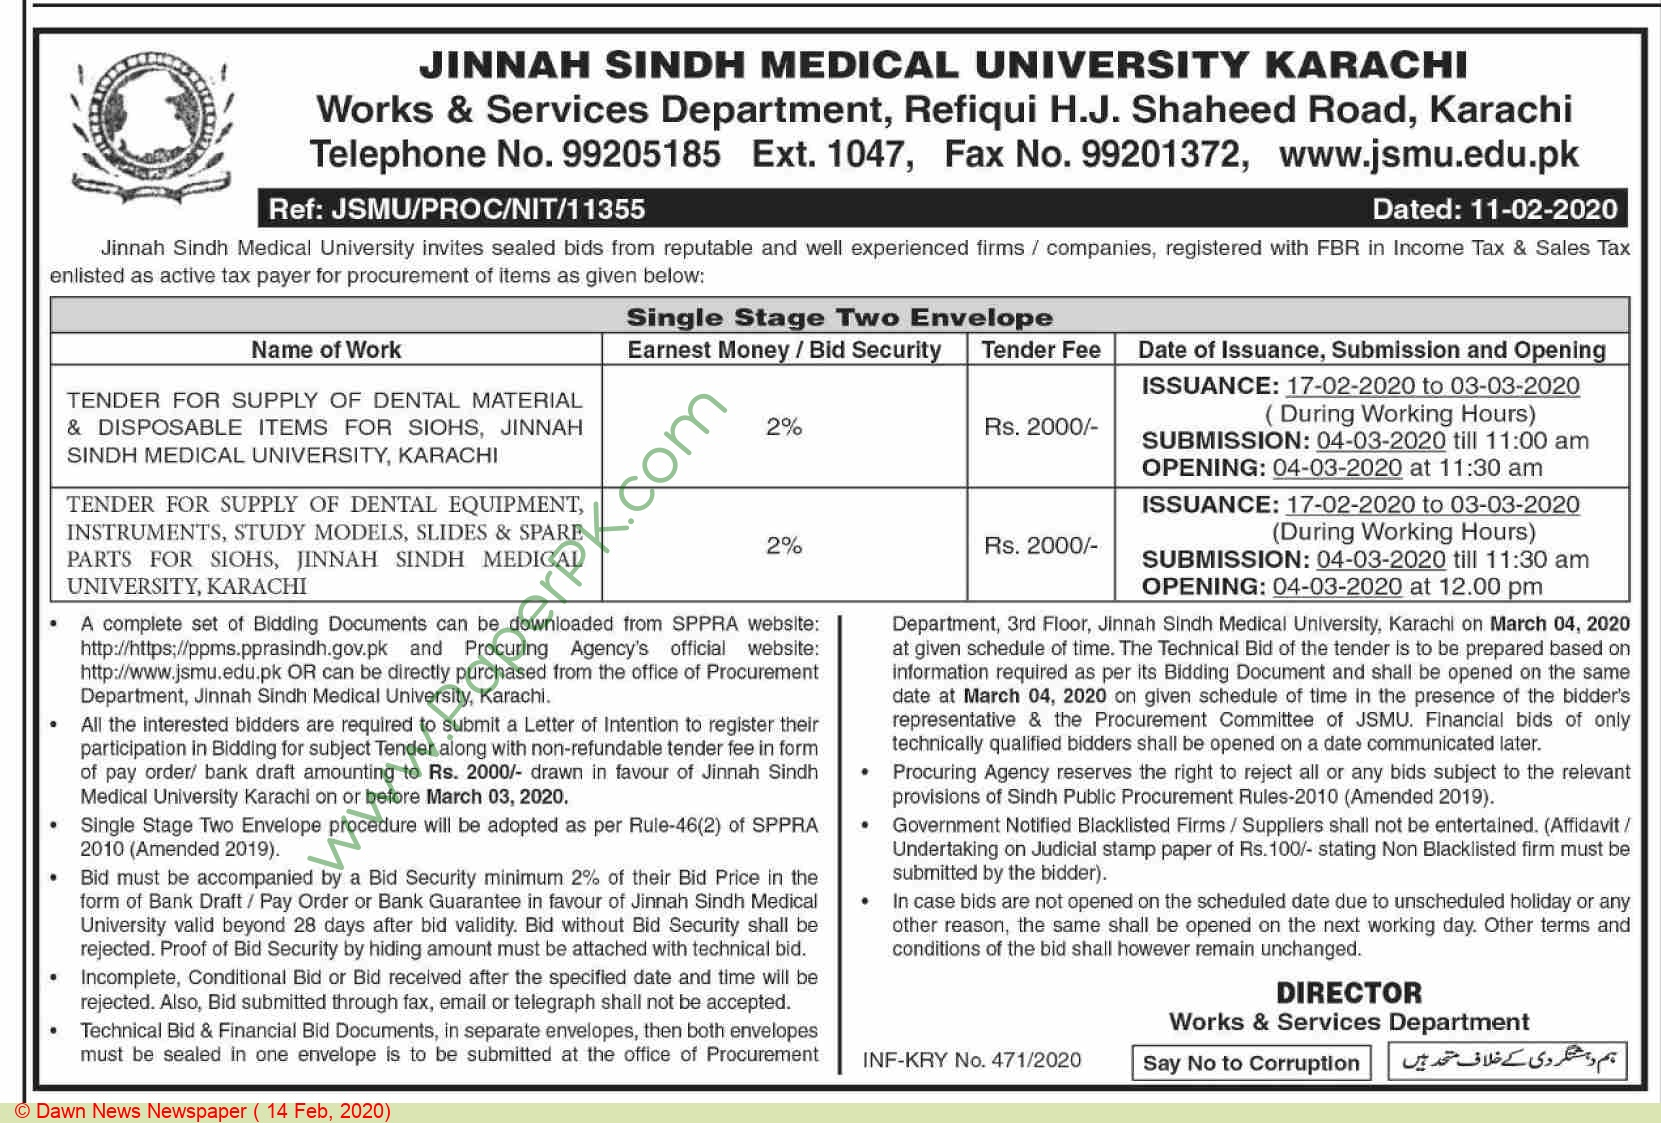 Works & Services Department Karachi Tender Notice